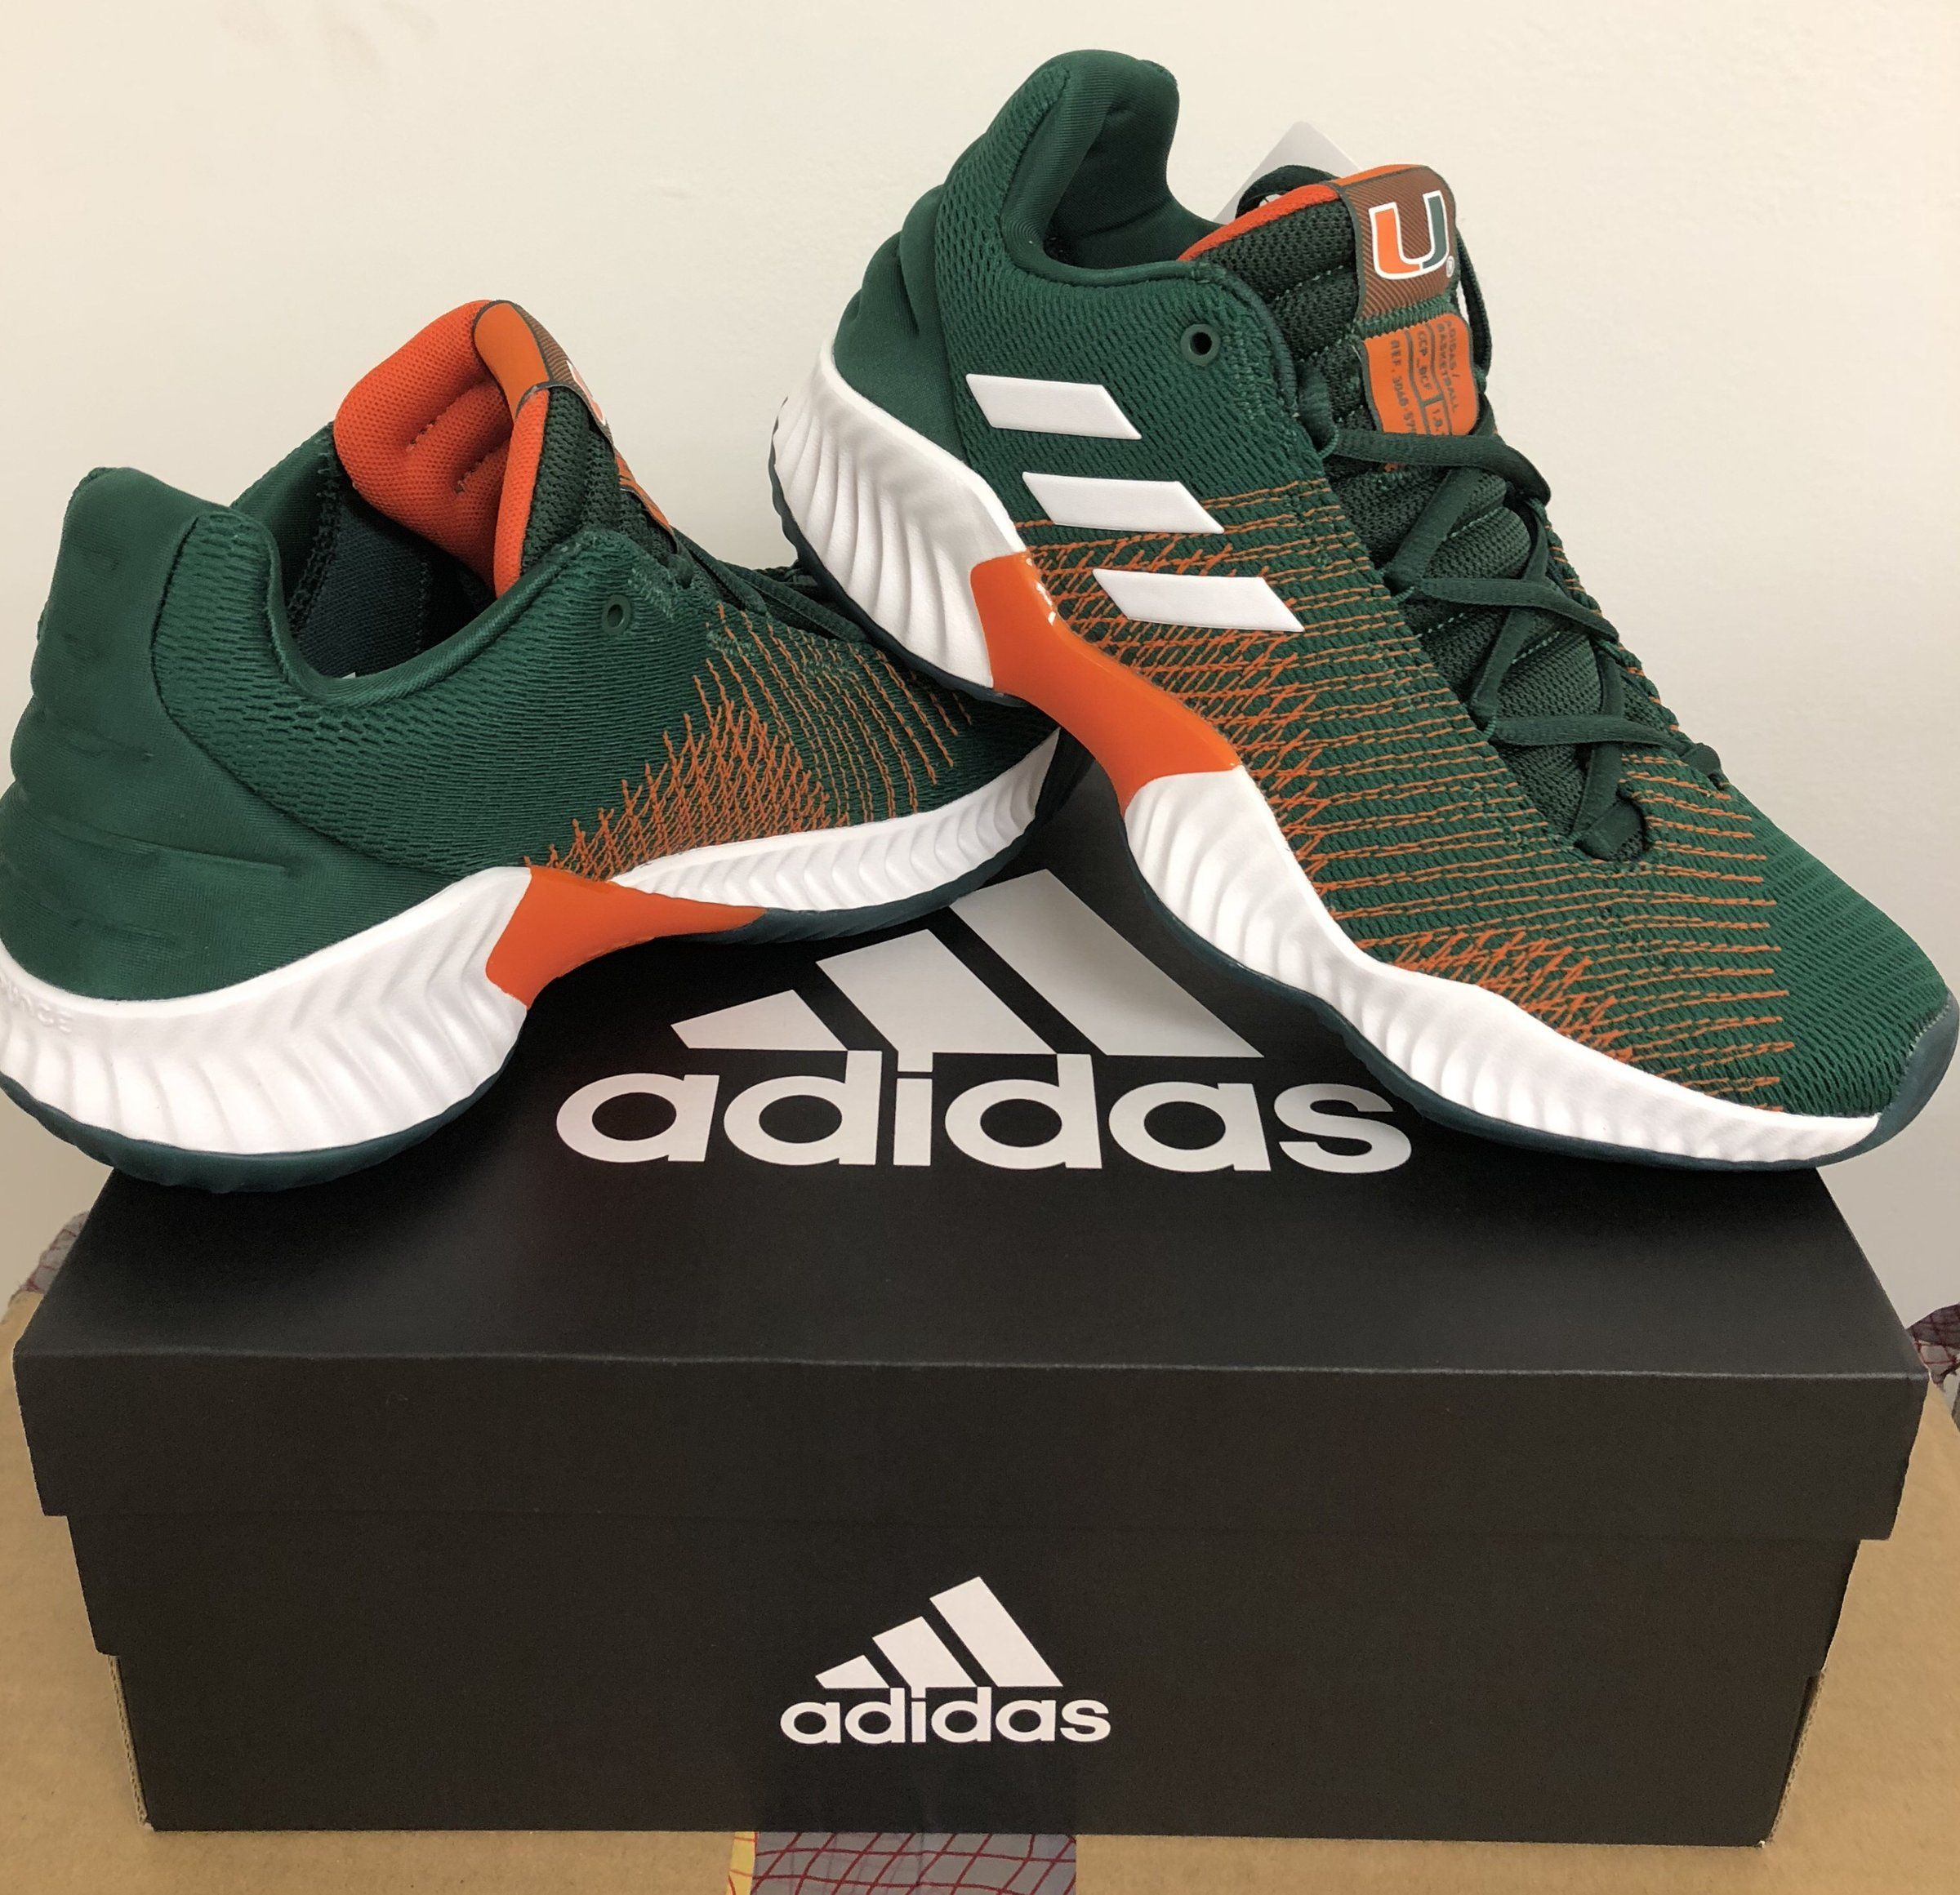 Miami Hurricanes adidas Pro Bounce Shoe